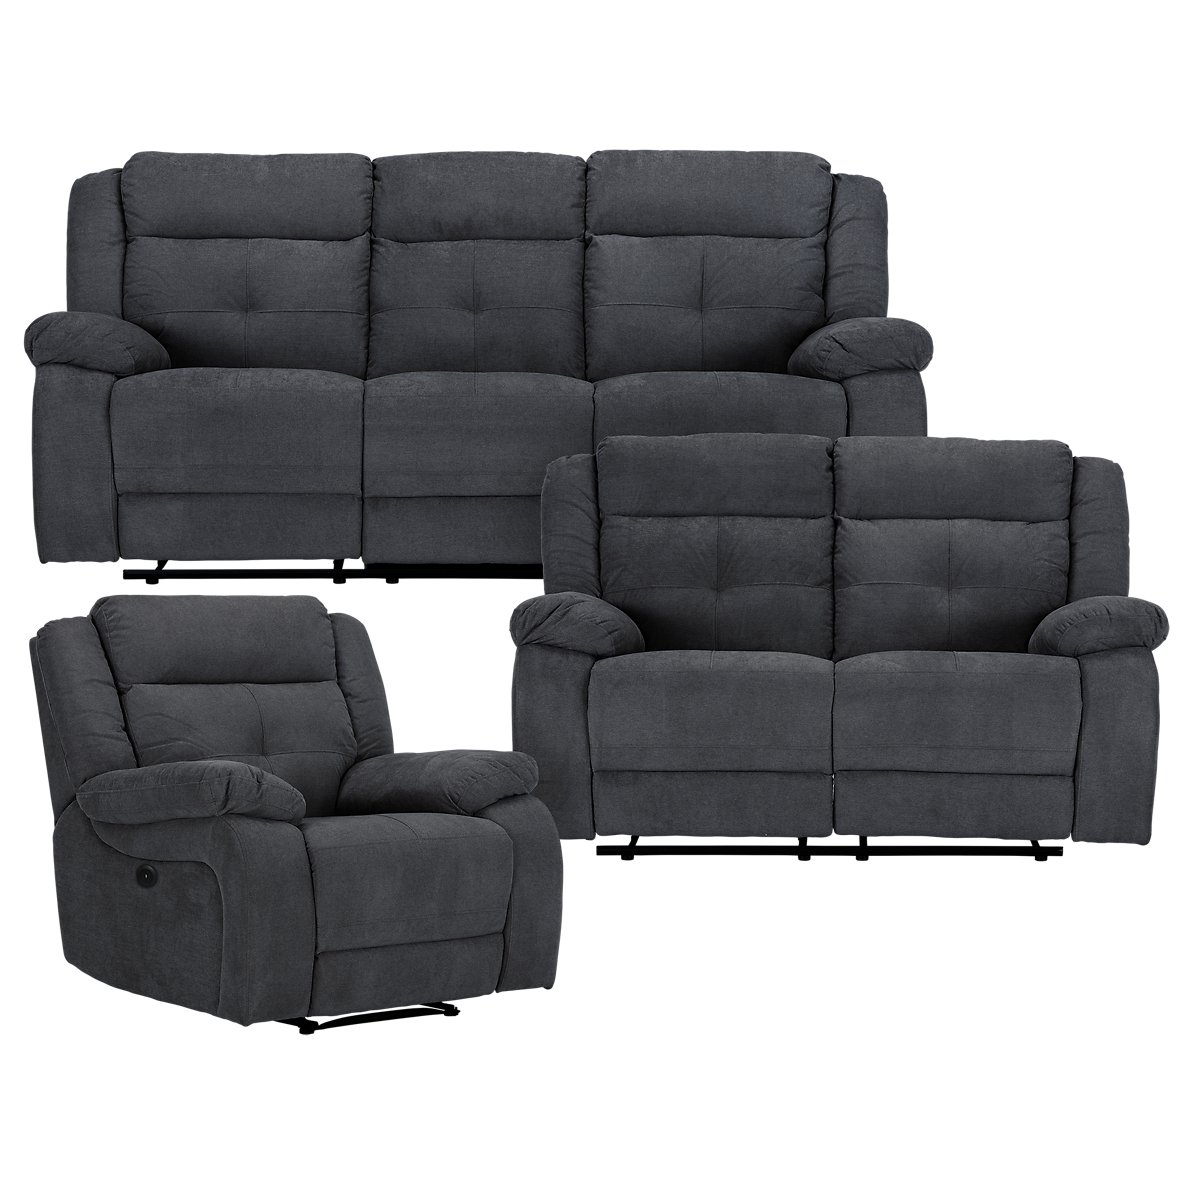 City Furniture Pierce Dark Gray Microfiber Power Reclining Loveseat